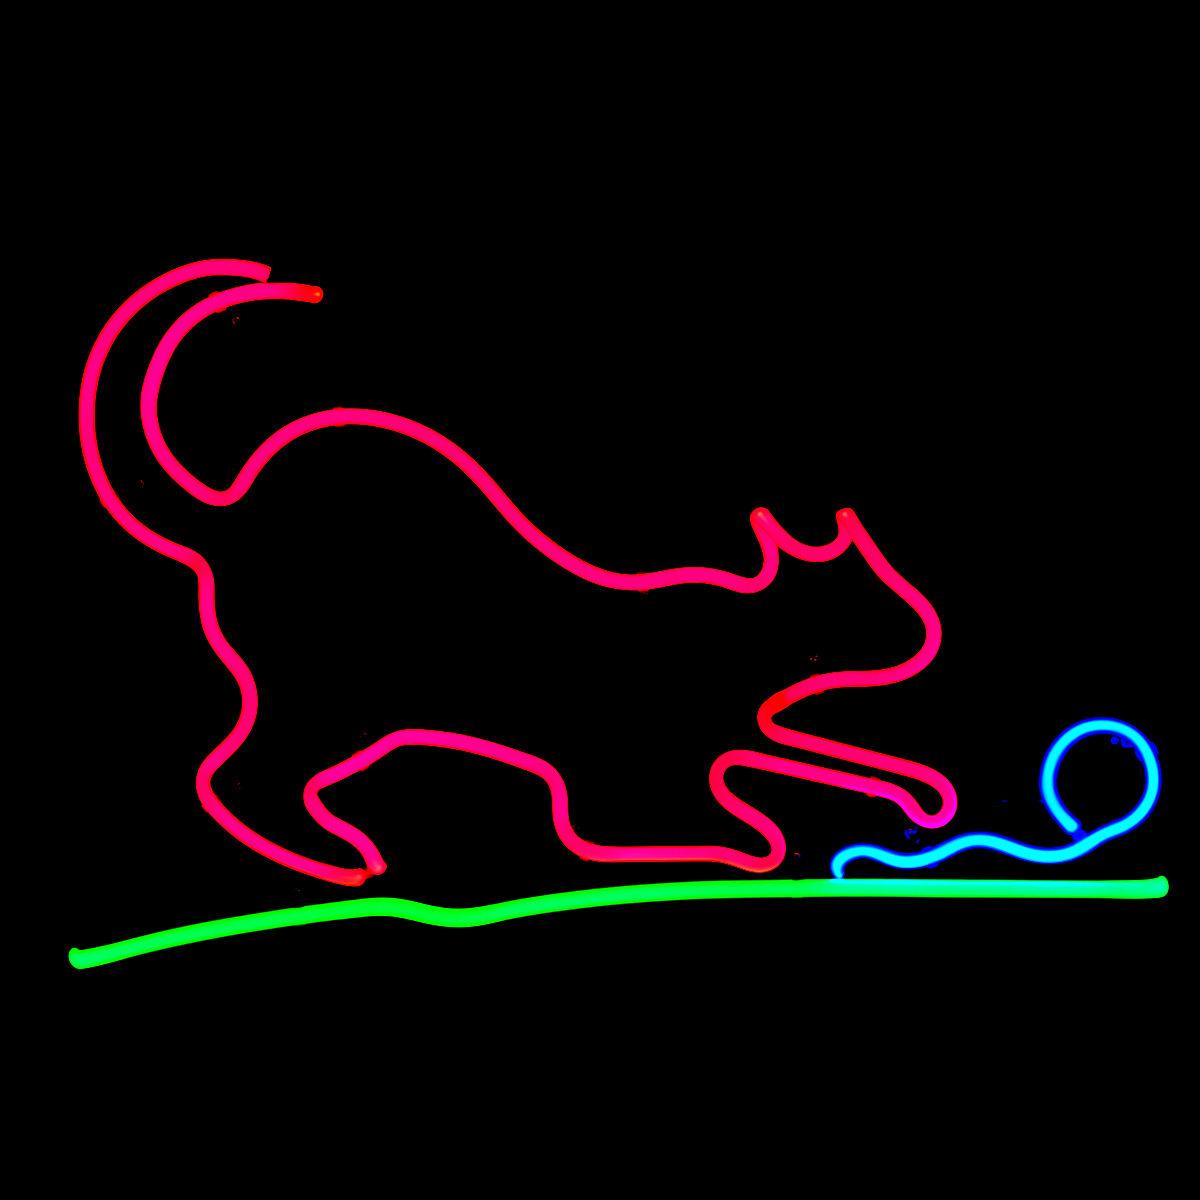 """ONE COOL CAT"" Designer Neon Light Sculpture by John Barton - BartonNeonMagic.com"